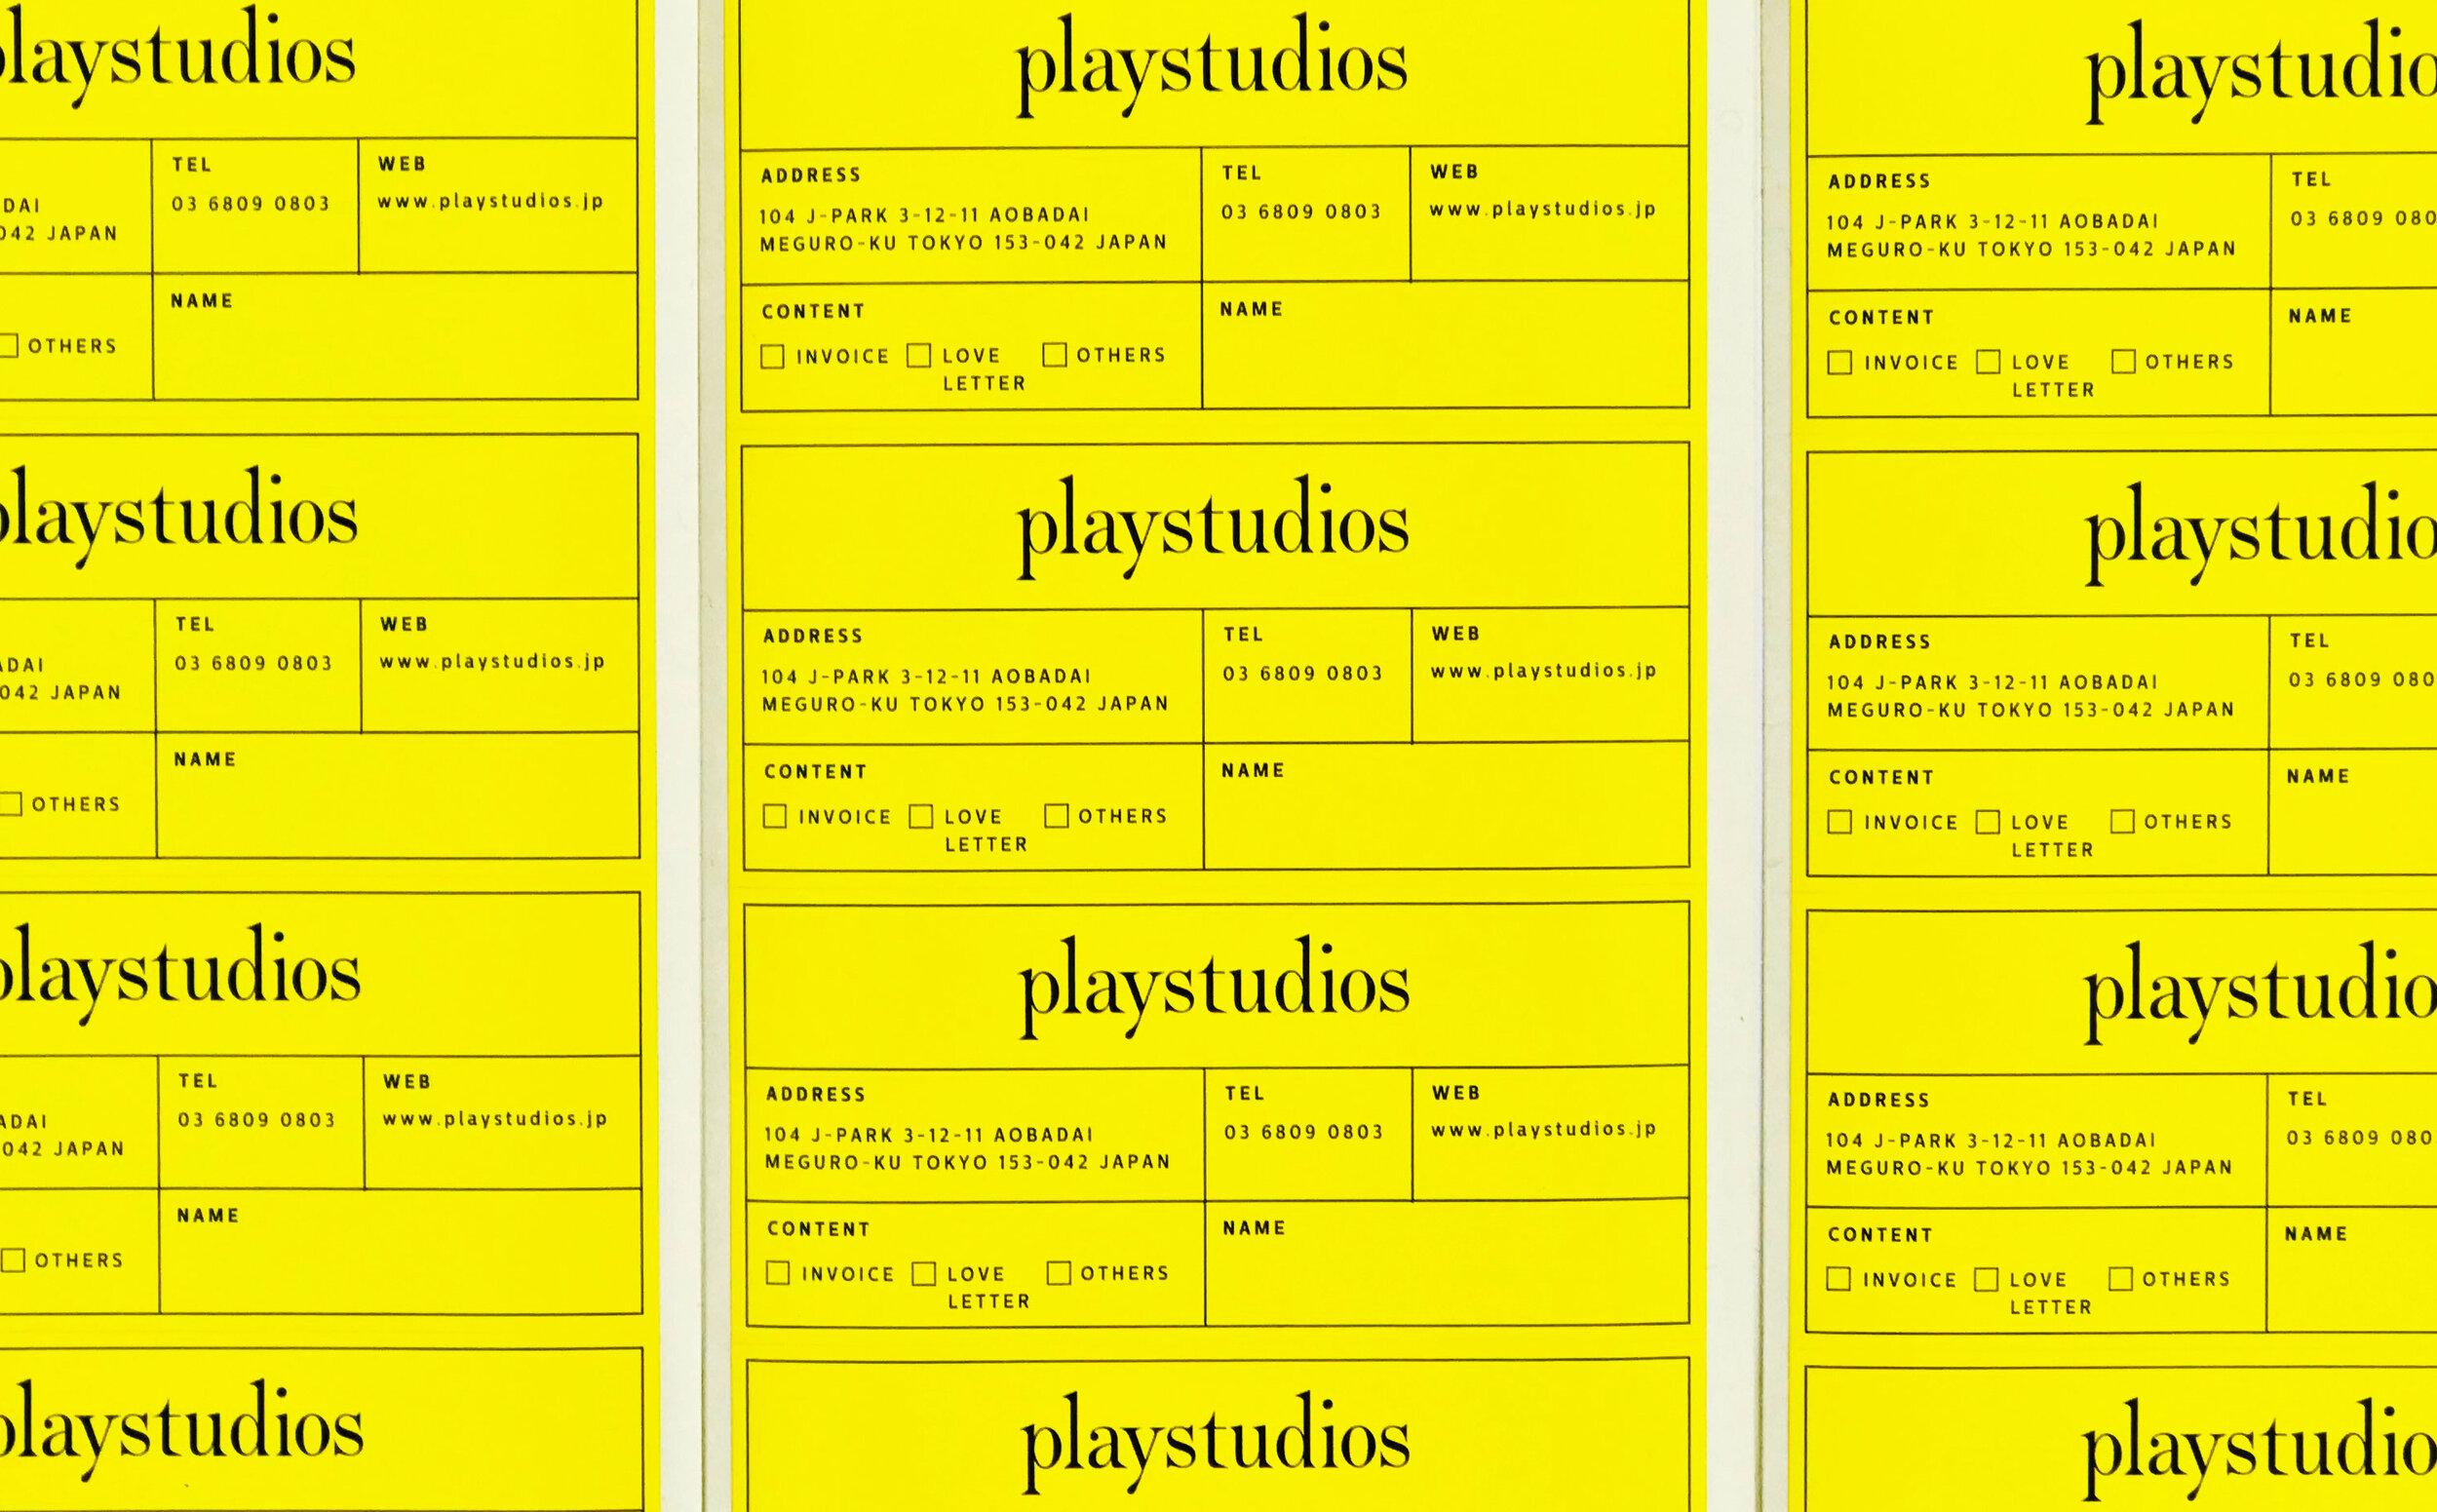 playstudiosステッカー_image4.jpg